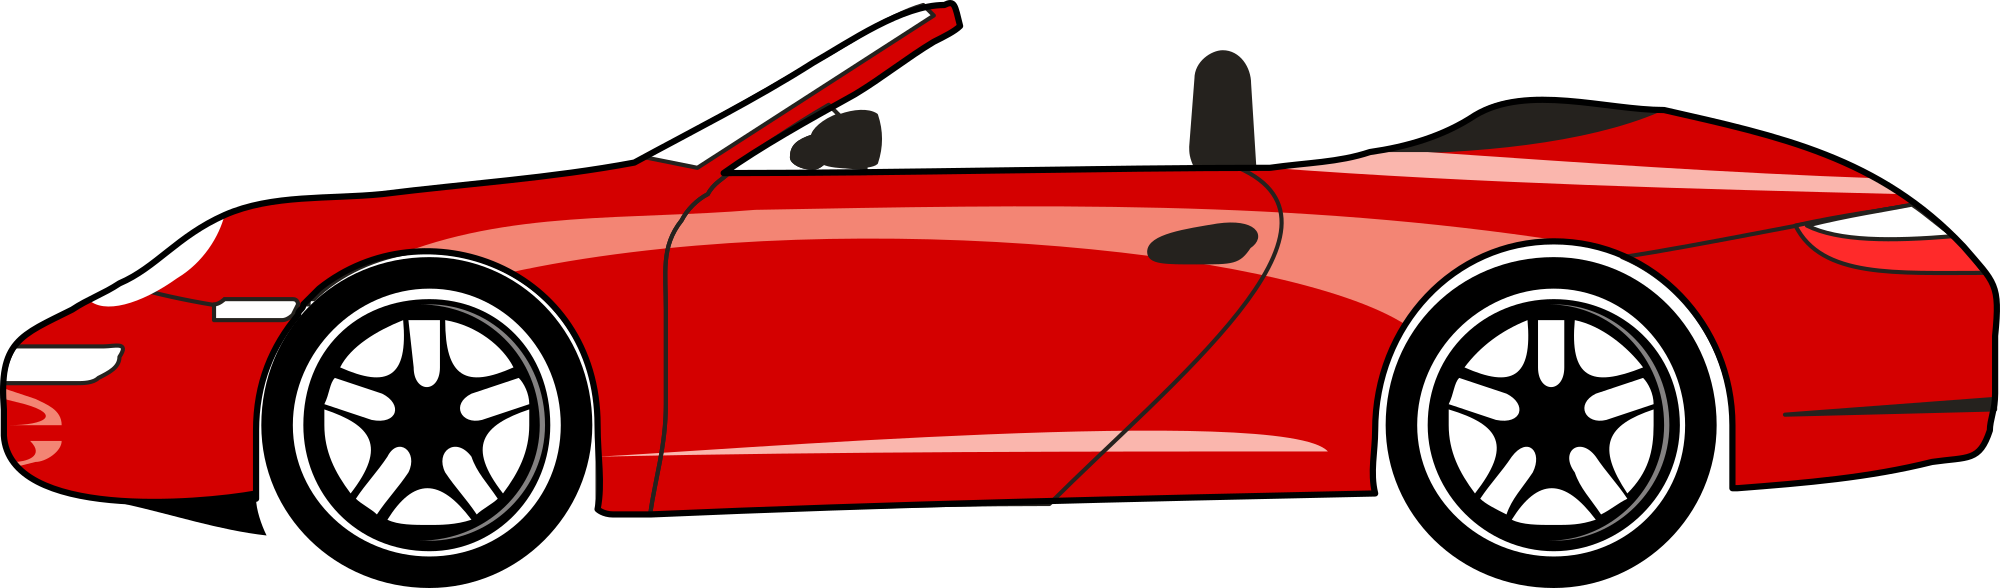 Race clipart clip art. Car cartoon png free